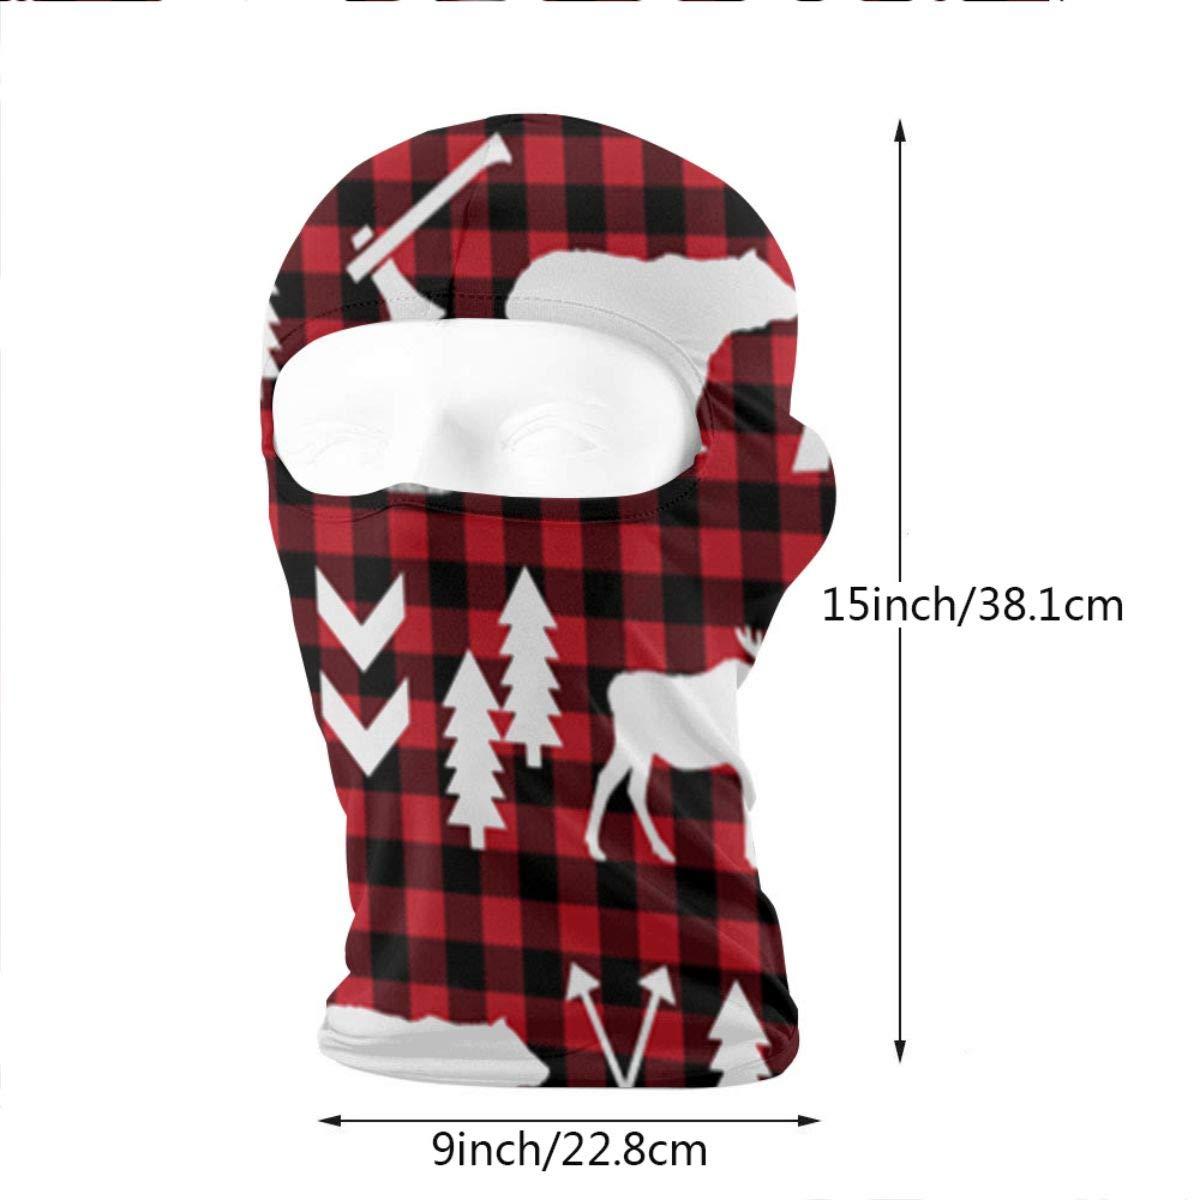 LaoJi Cartoon Red Love Winter Ski Mask Balaclava Hood Wind-Resistant Face Mask